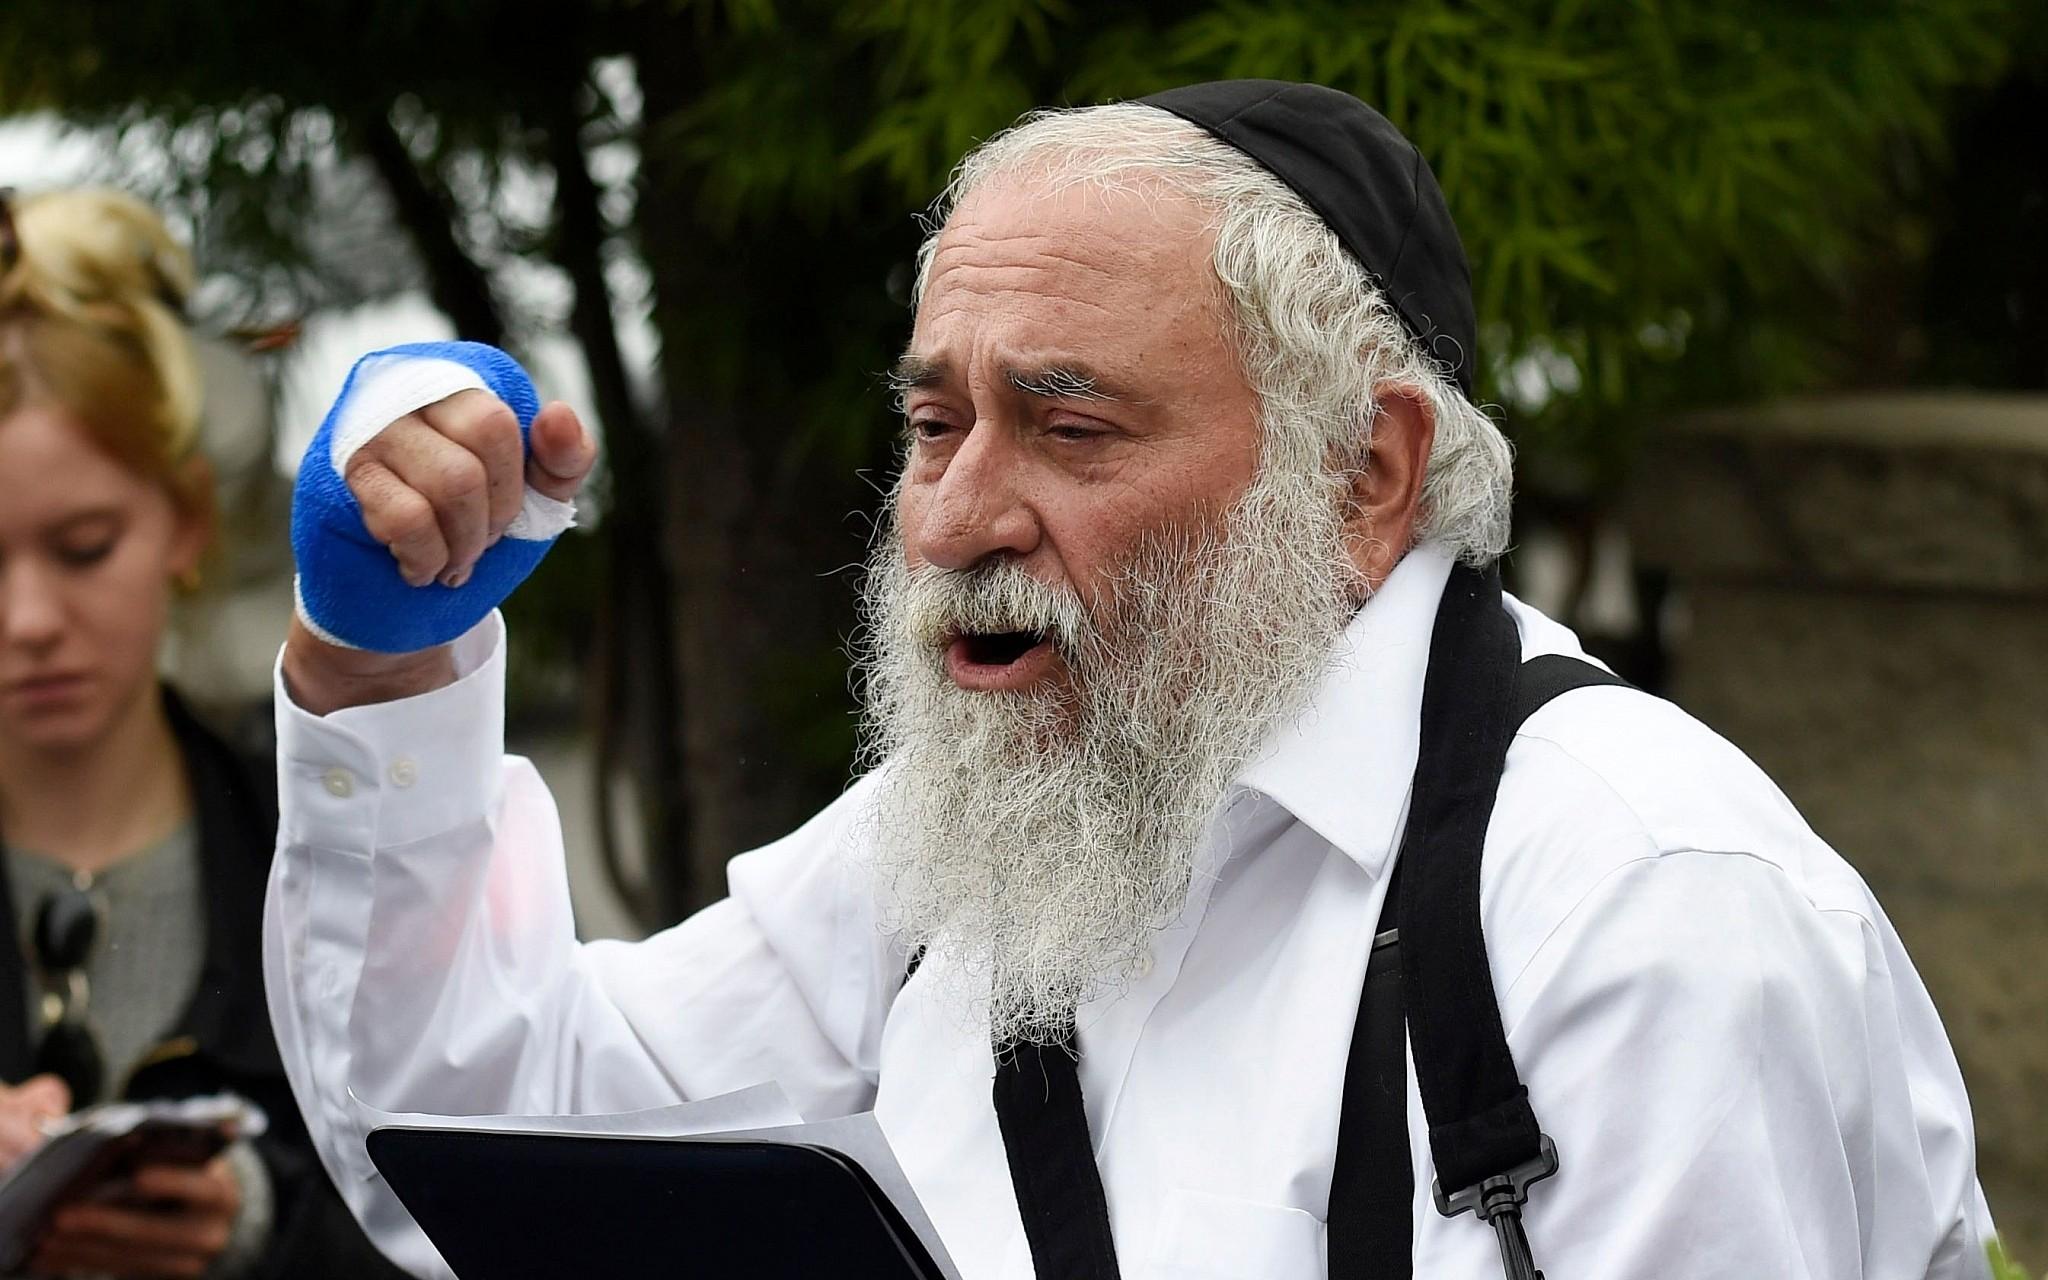 Rabbi-speaks-after-shooting-at-synagogue